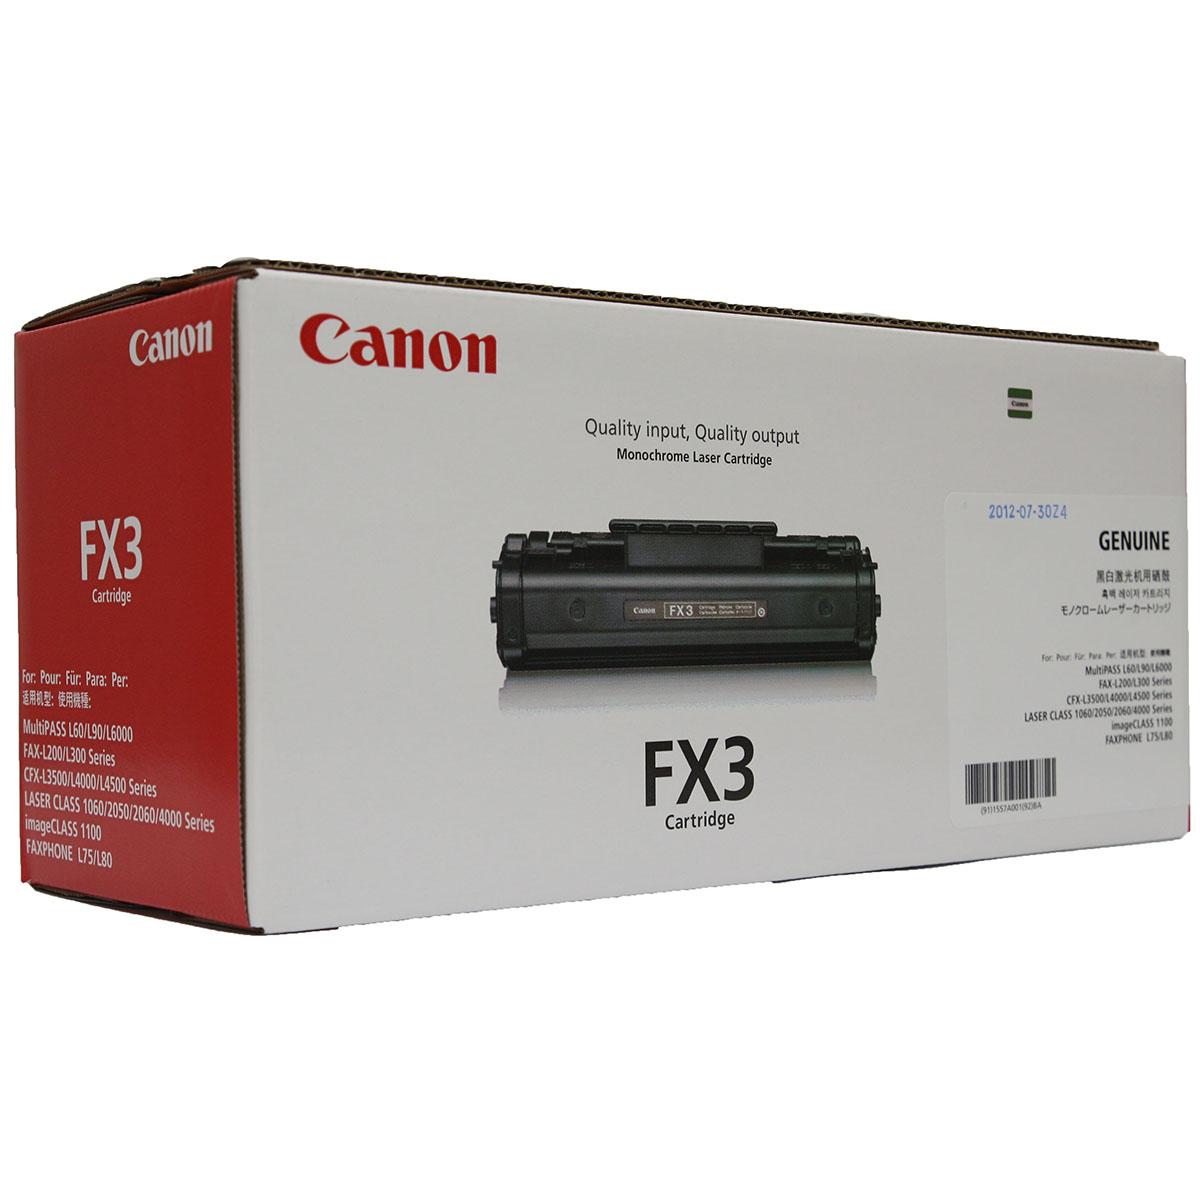 Cartucho Toner Canon FX3 Preto Original Novo